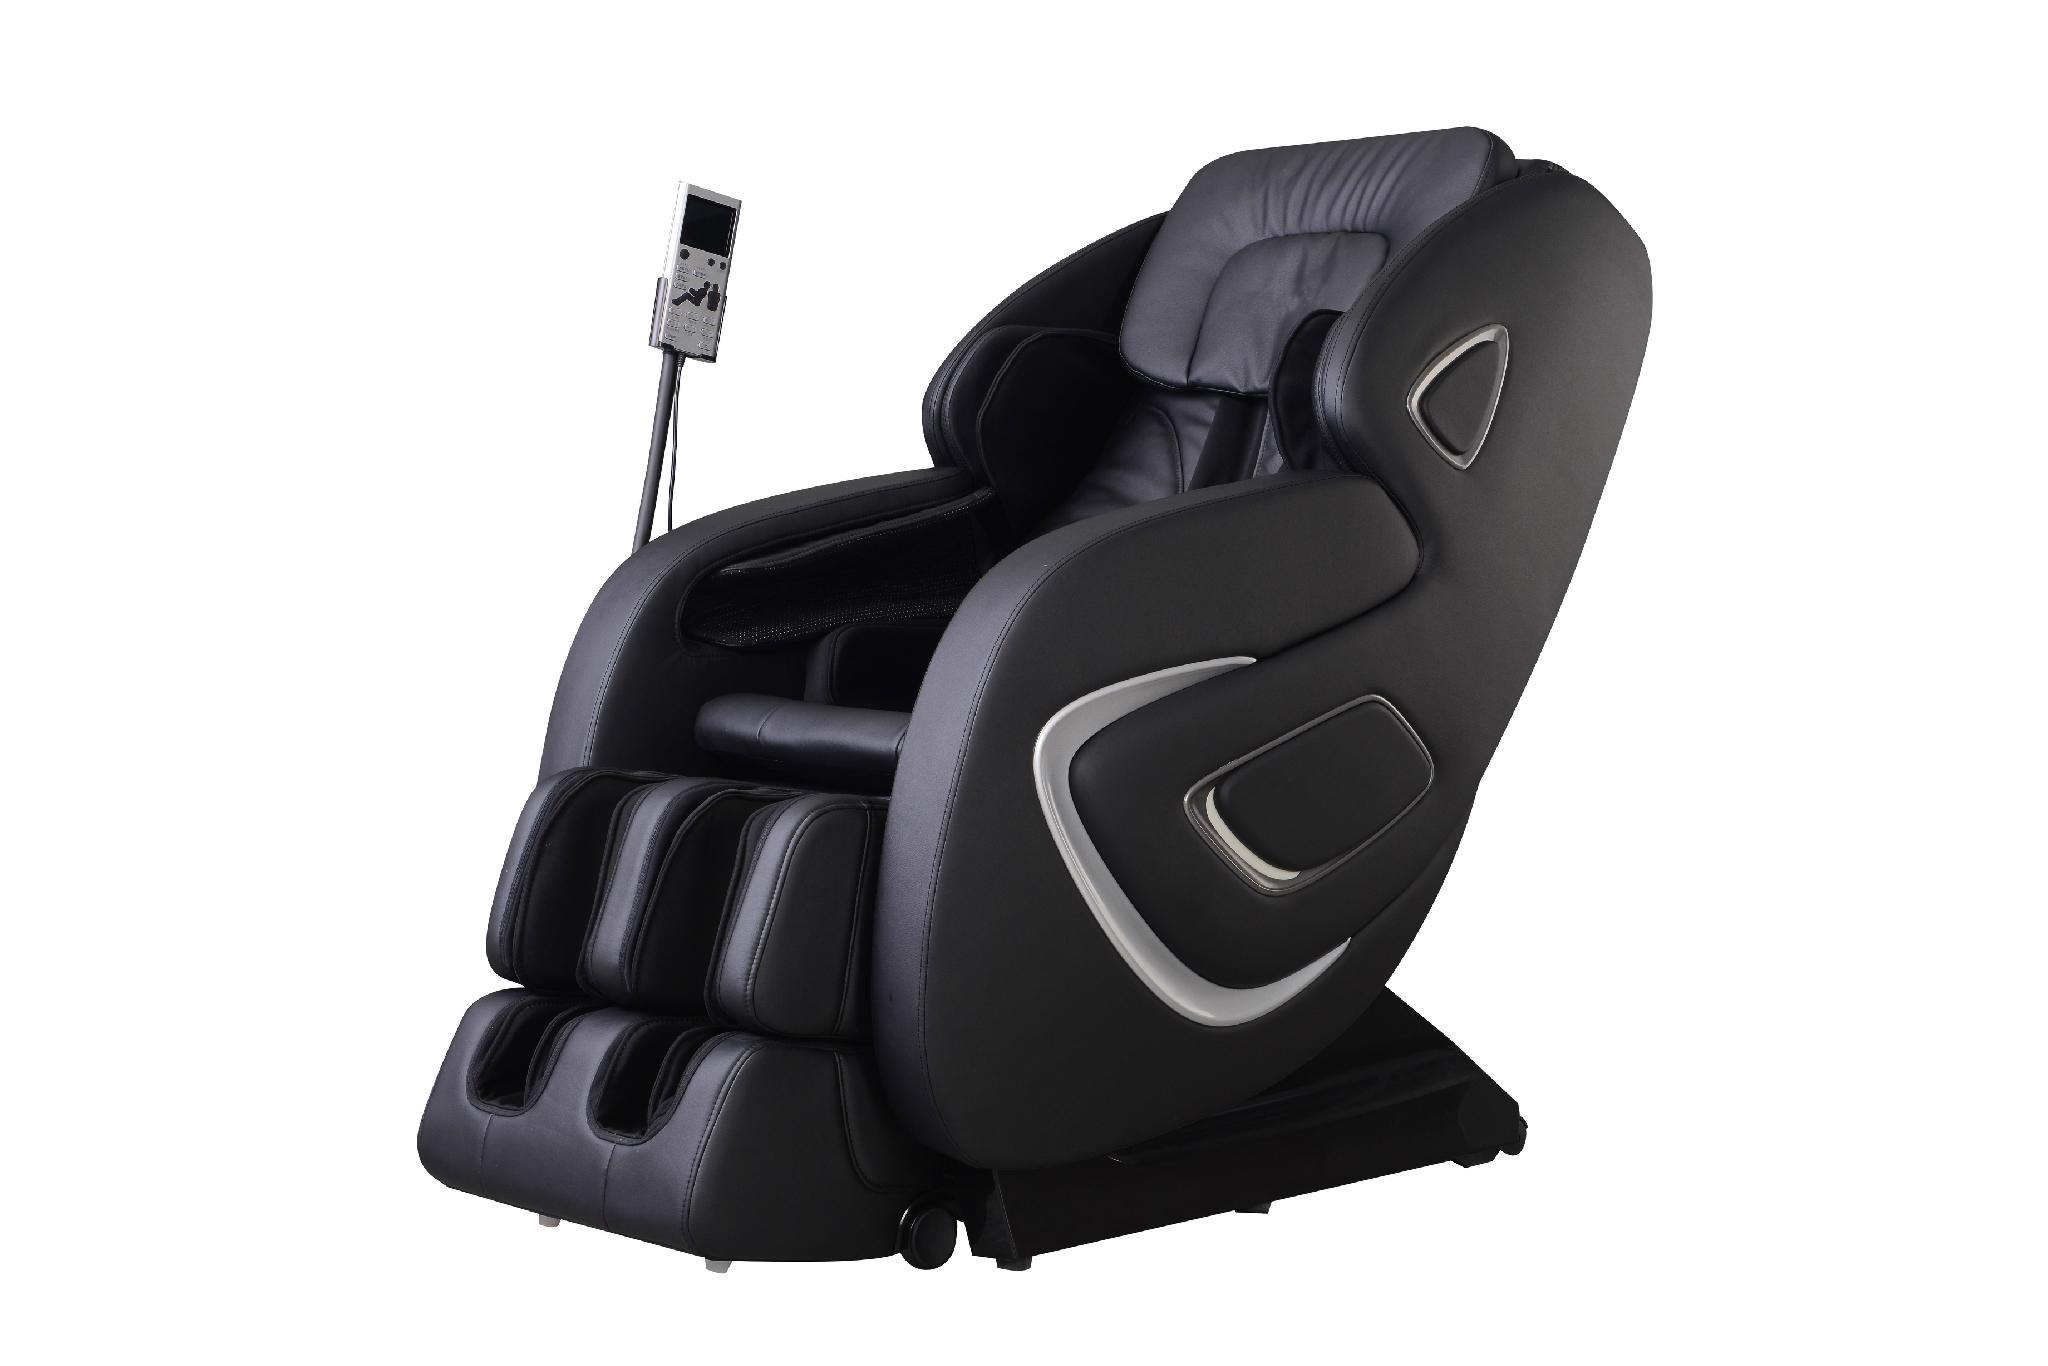 Zero Gravity 3D Deluxe Massage Chair 1 ...